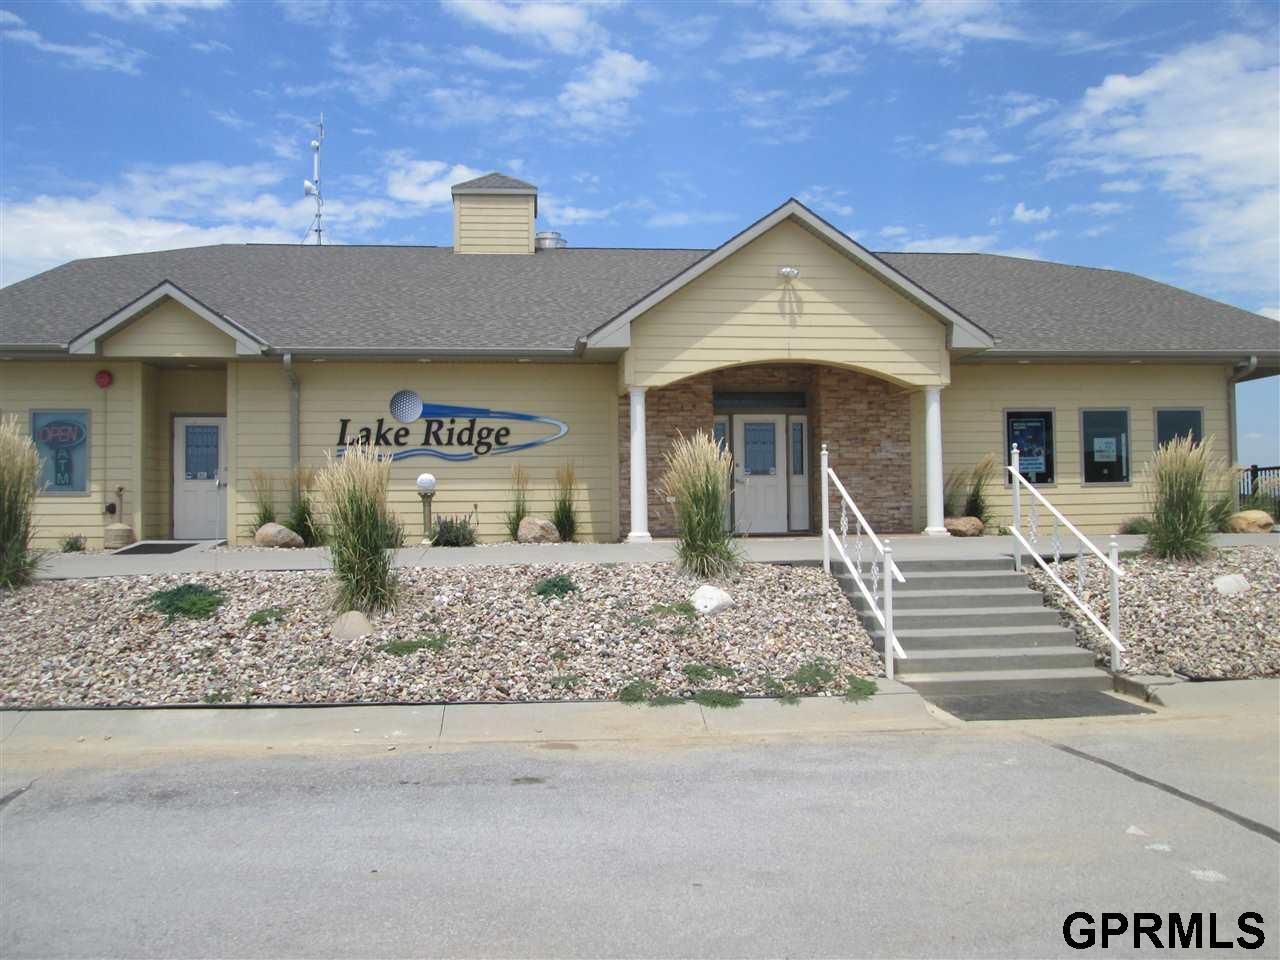 8620 Lakeridge Drive - Photo 1